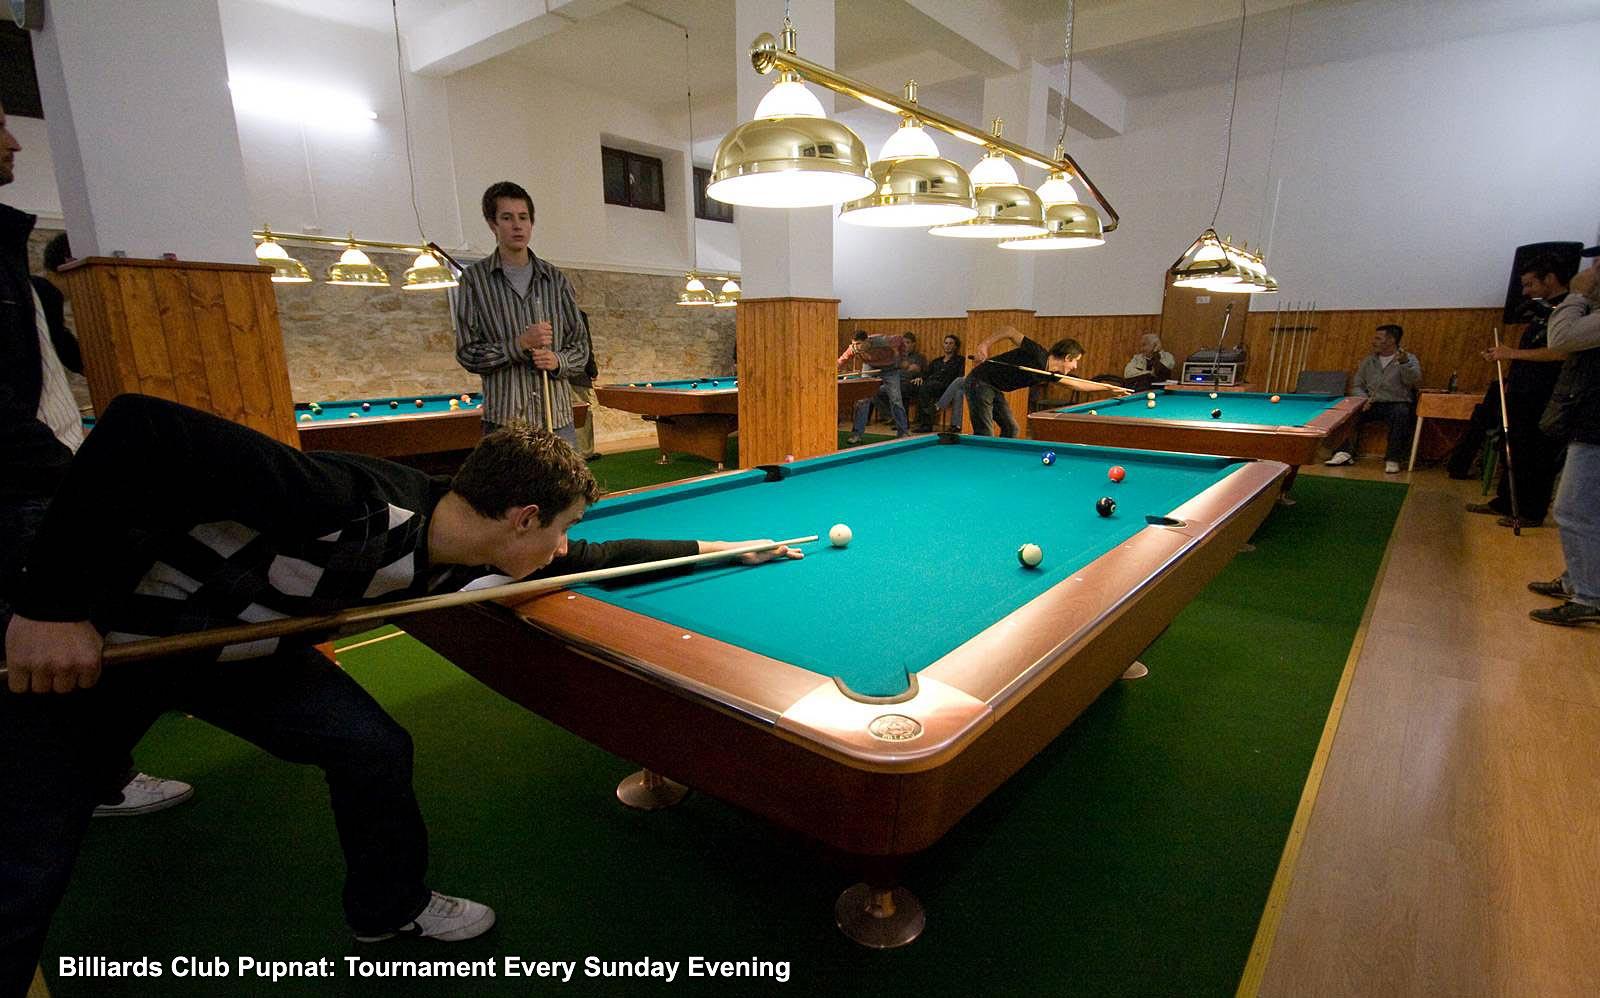 Billiards Club in Pupnat